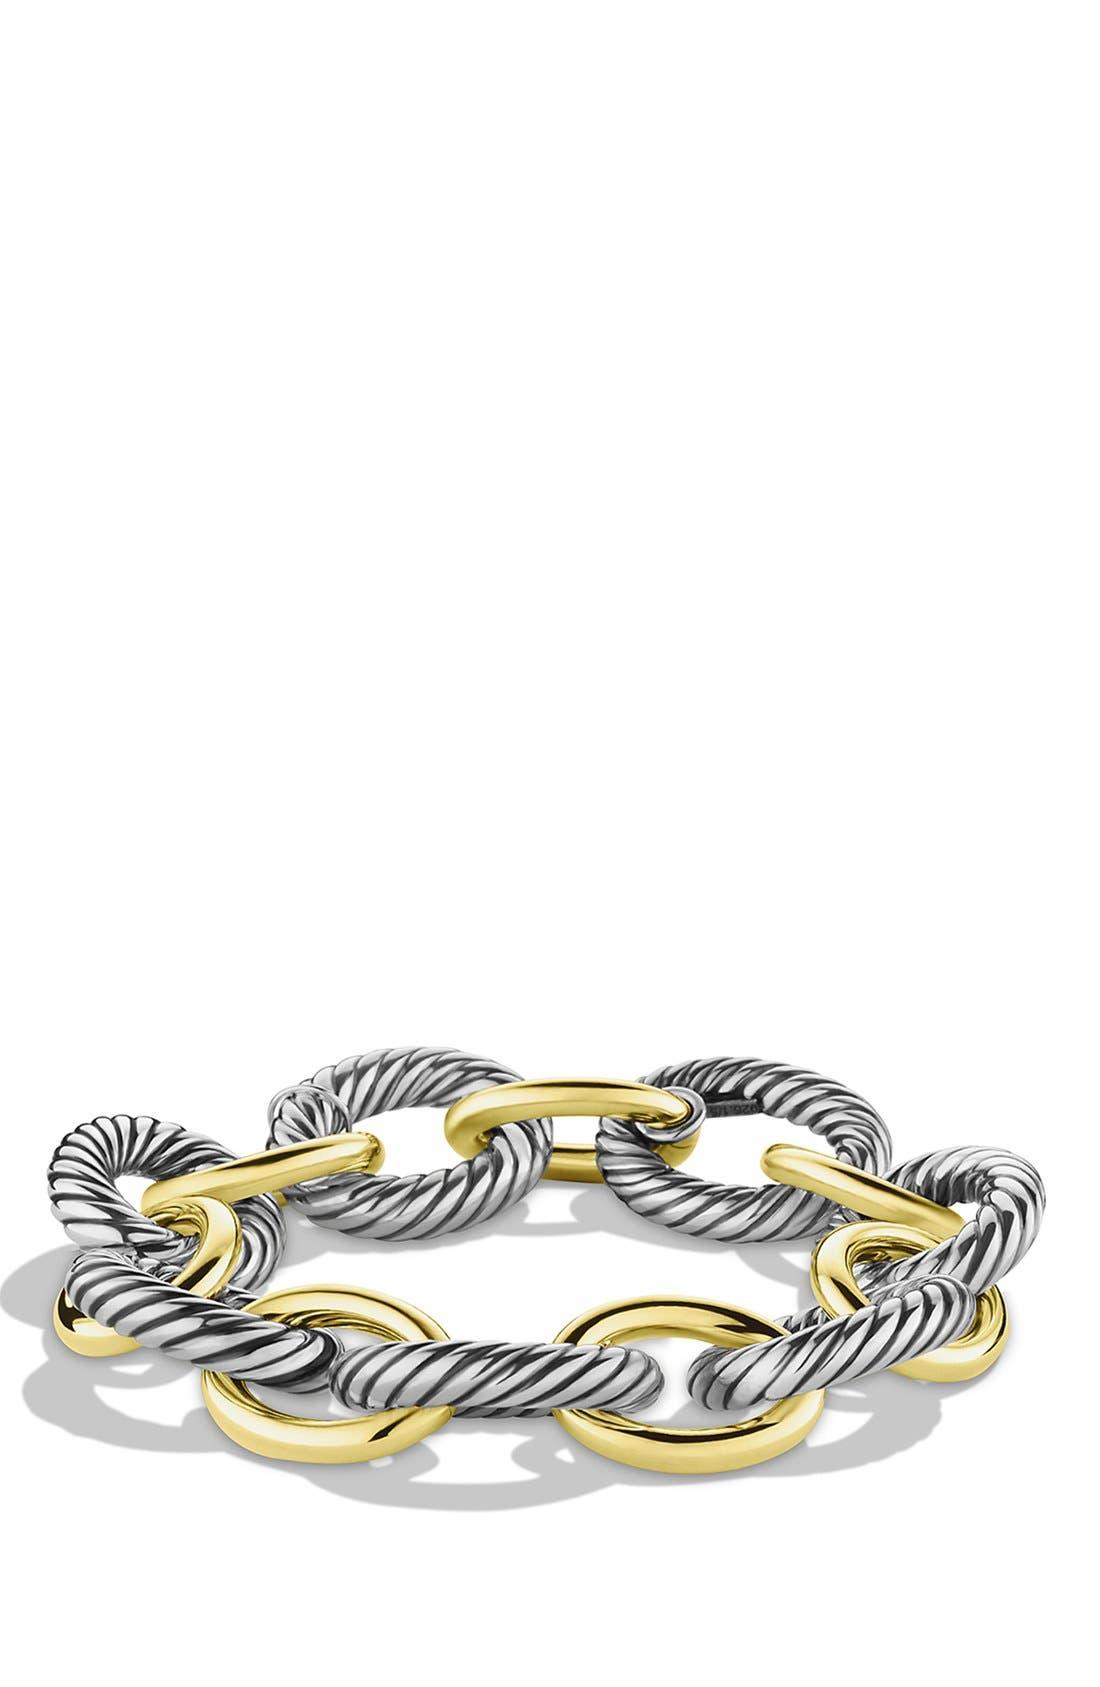 David Yurman 'Oval' Extra-Large Link Bracelet with Gold